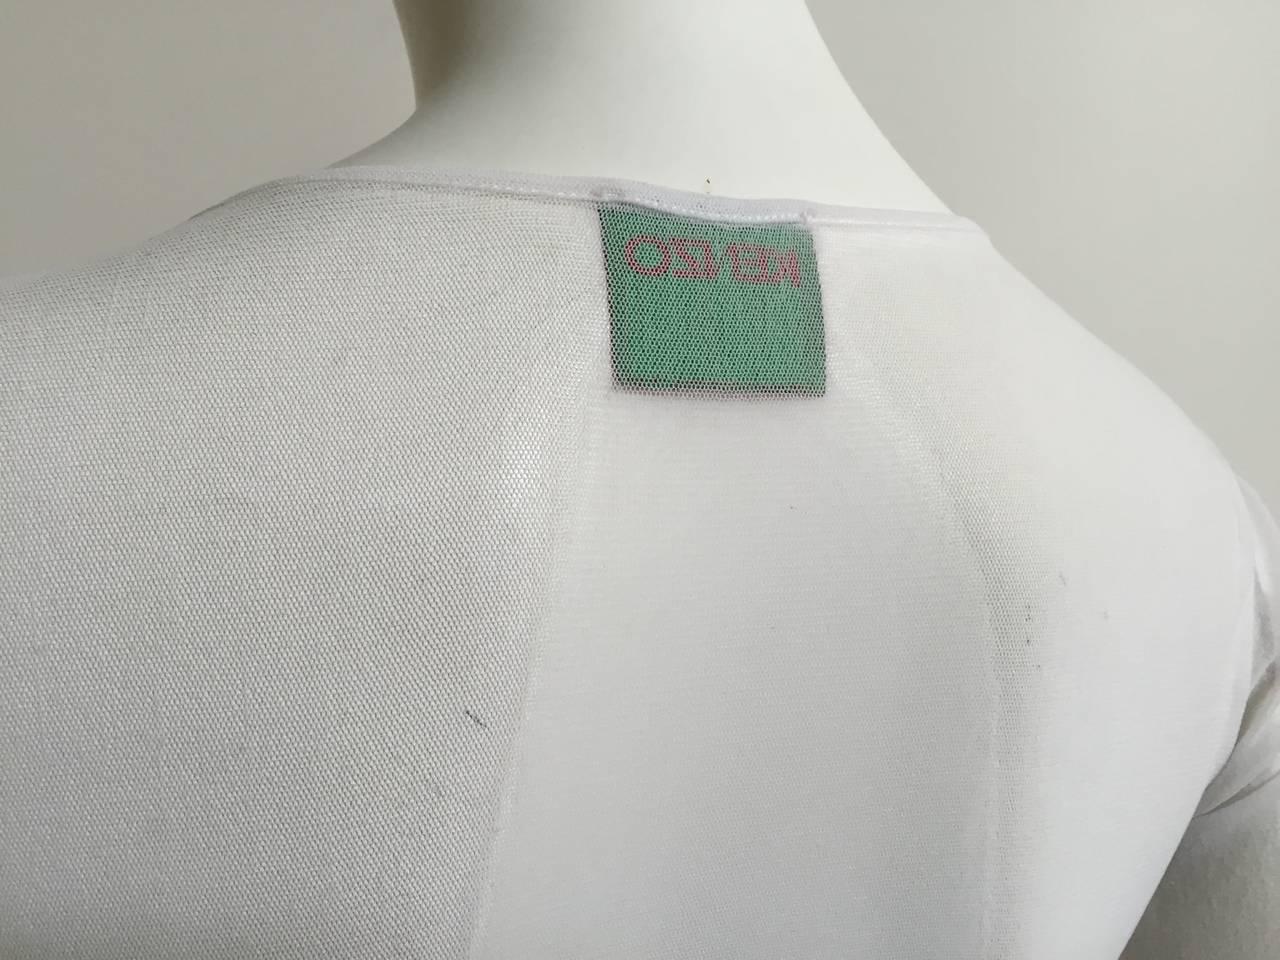 Kenzo Jungle Asian sheer long sleeve top size small. 7